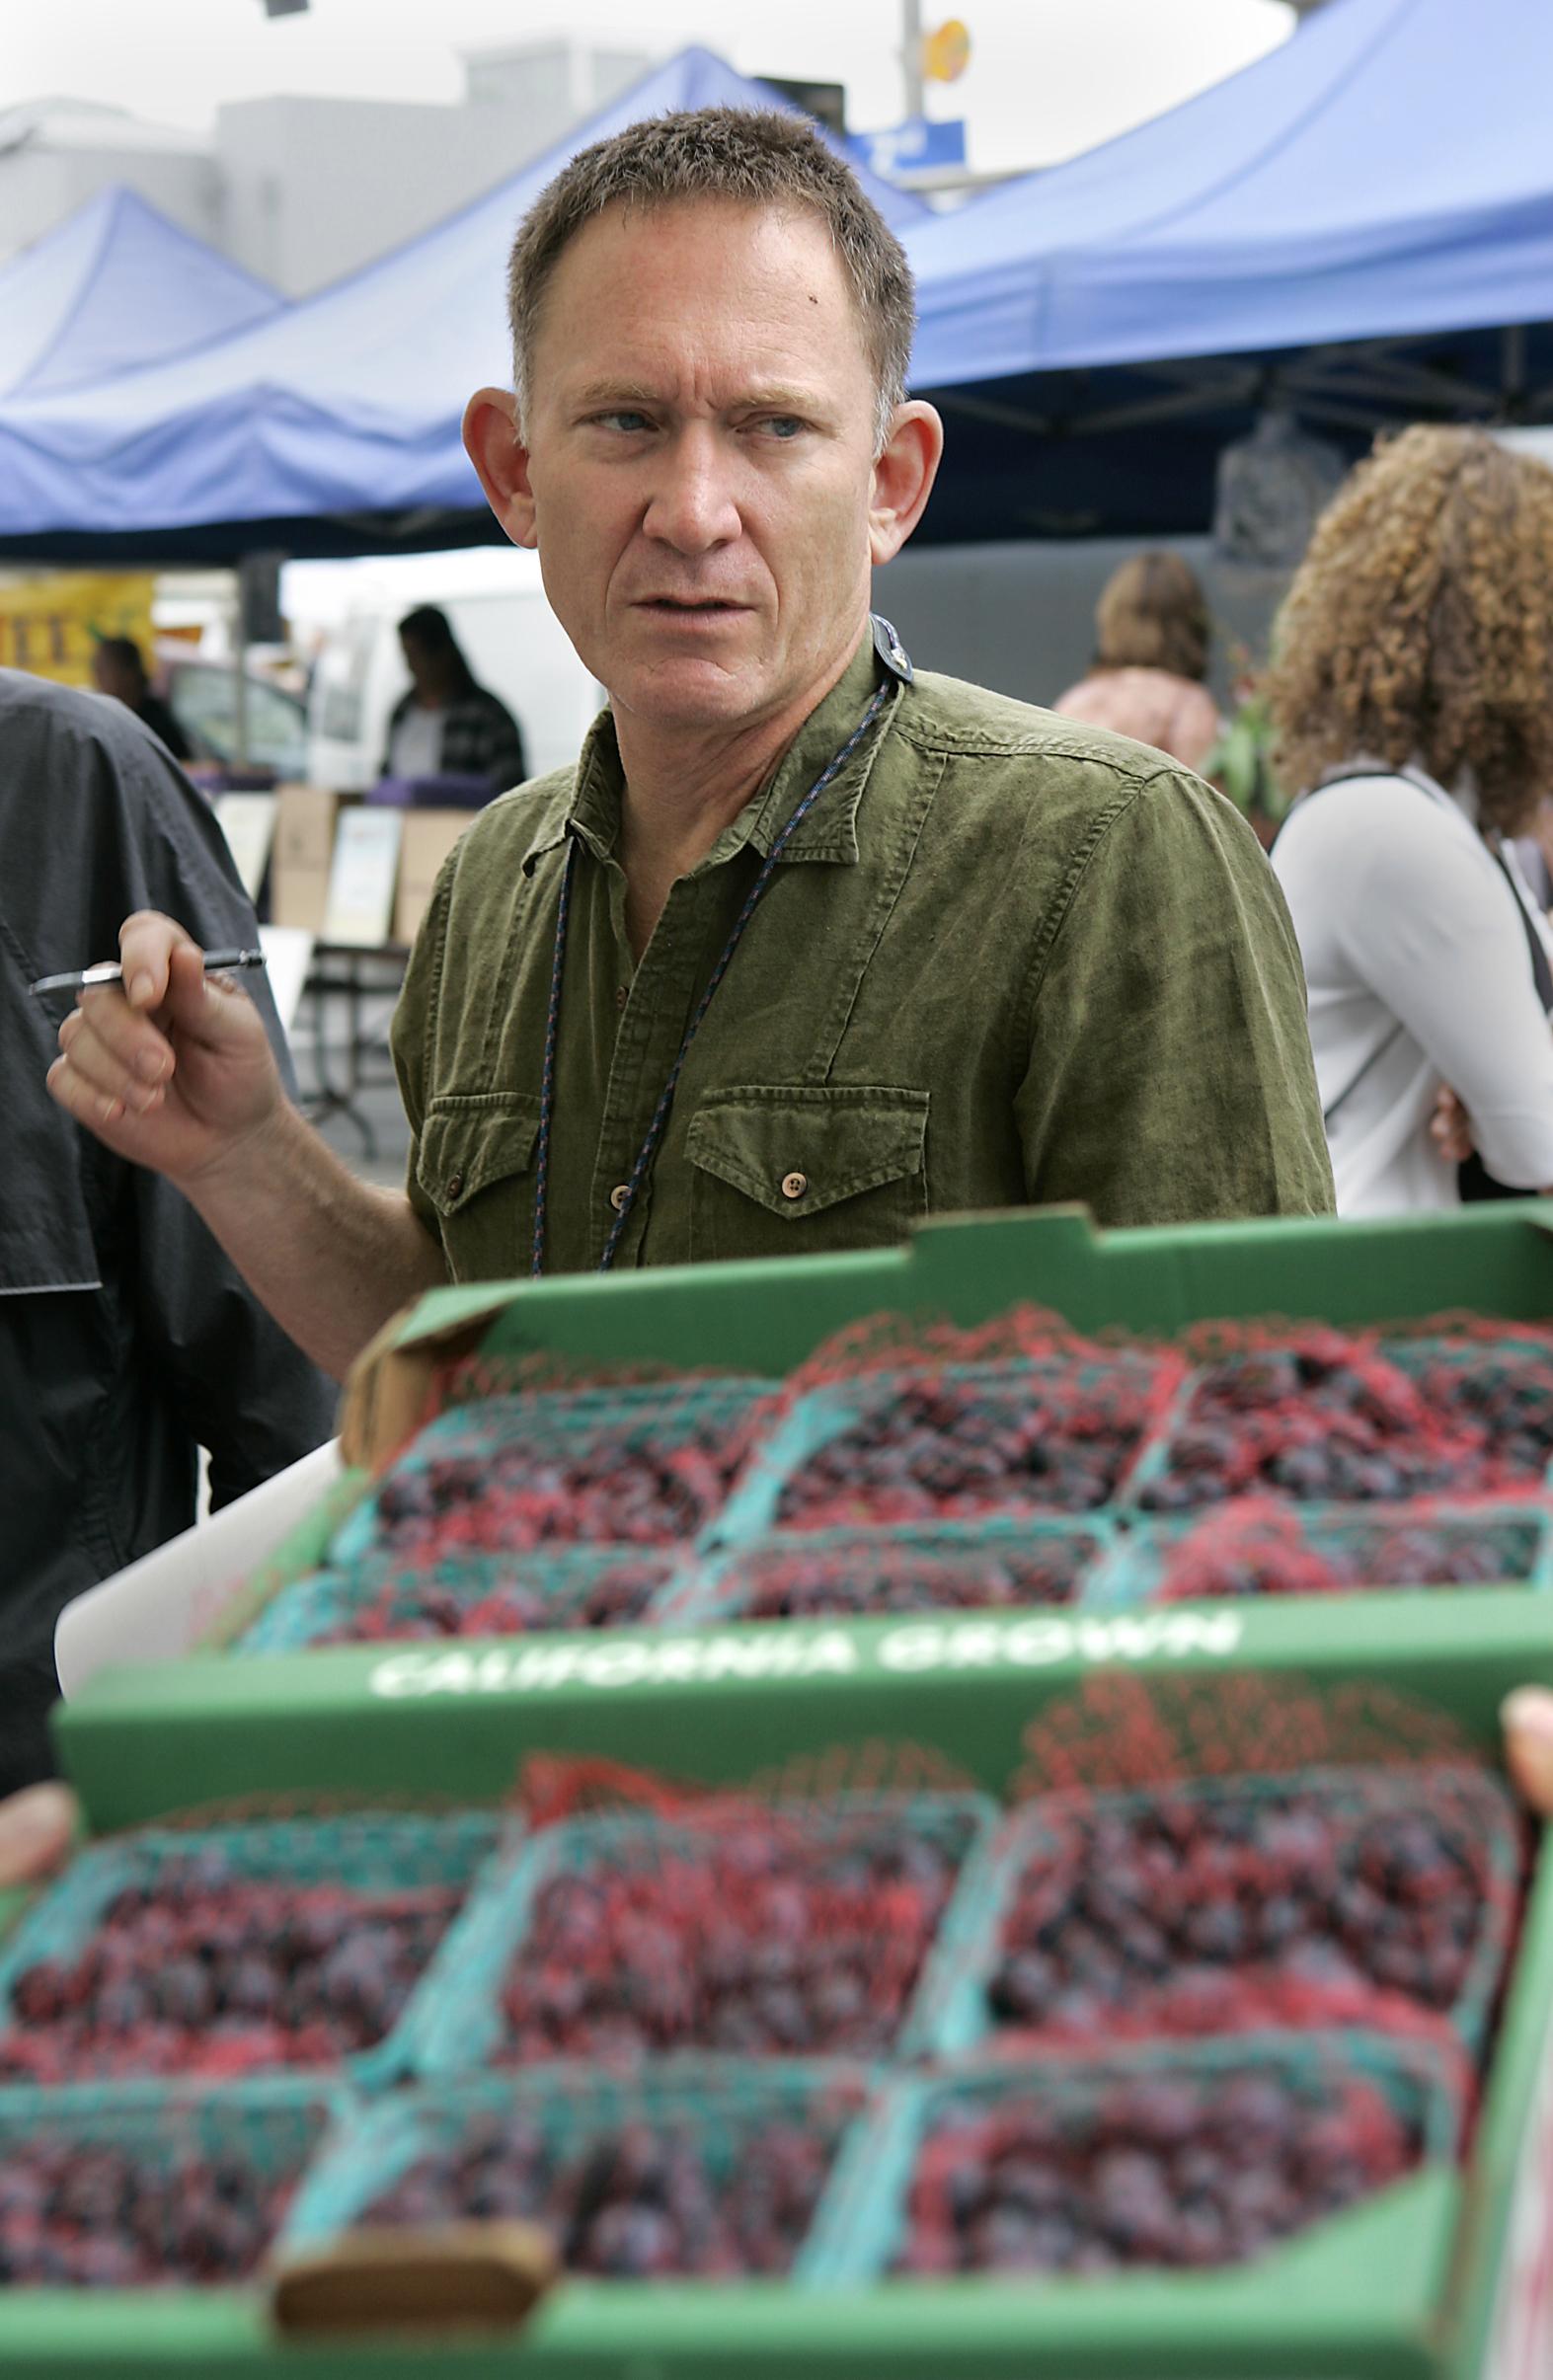 Photo of chef Mark Peel of Campanile shopping for berries at the Santa Monica Farmers Market, Wedne